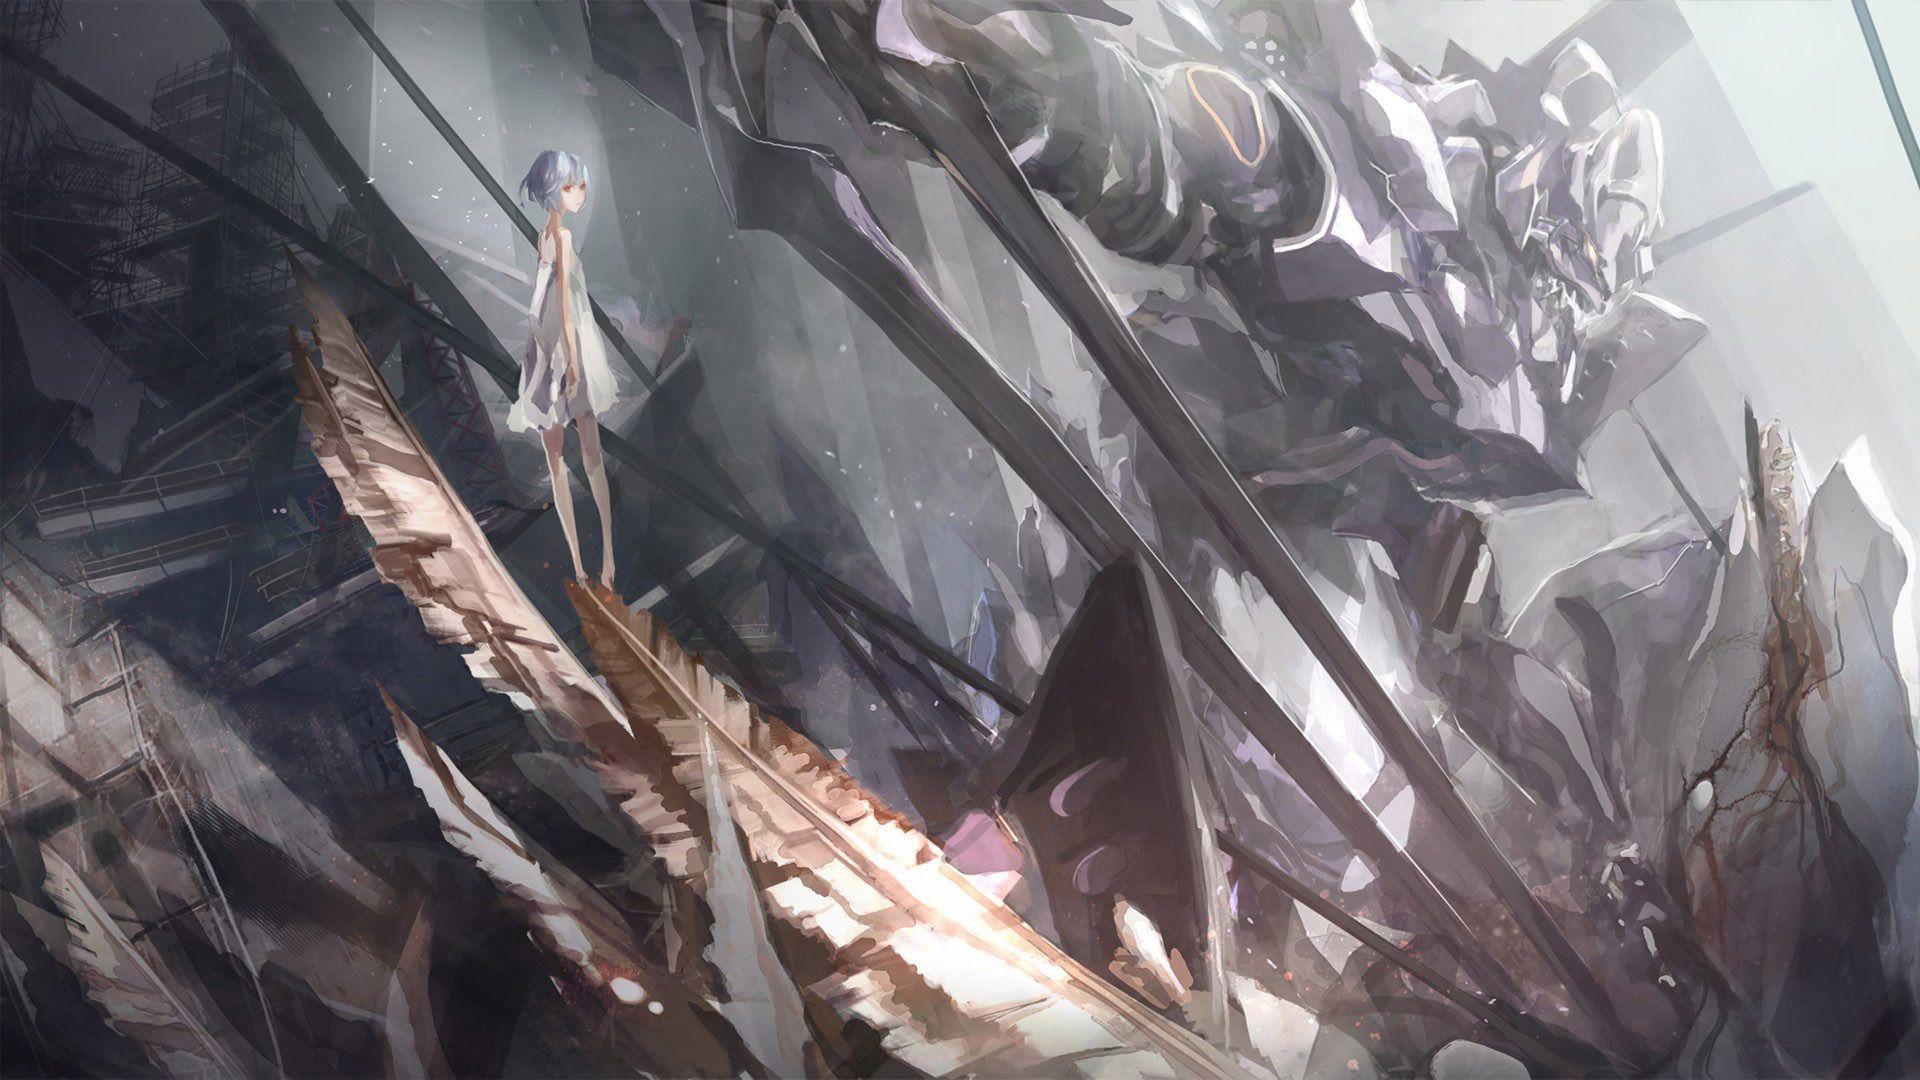 evangelion wallpaper hd anime - photo #7